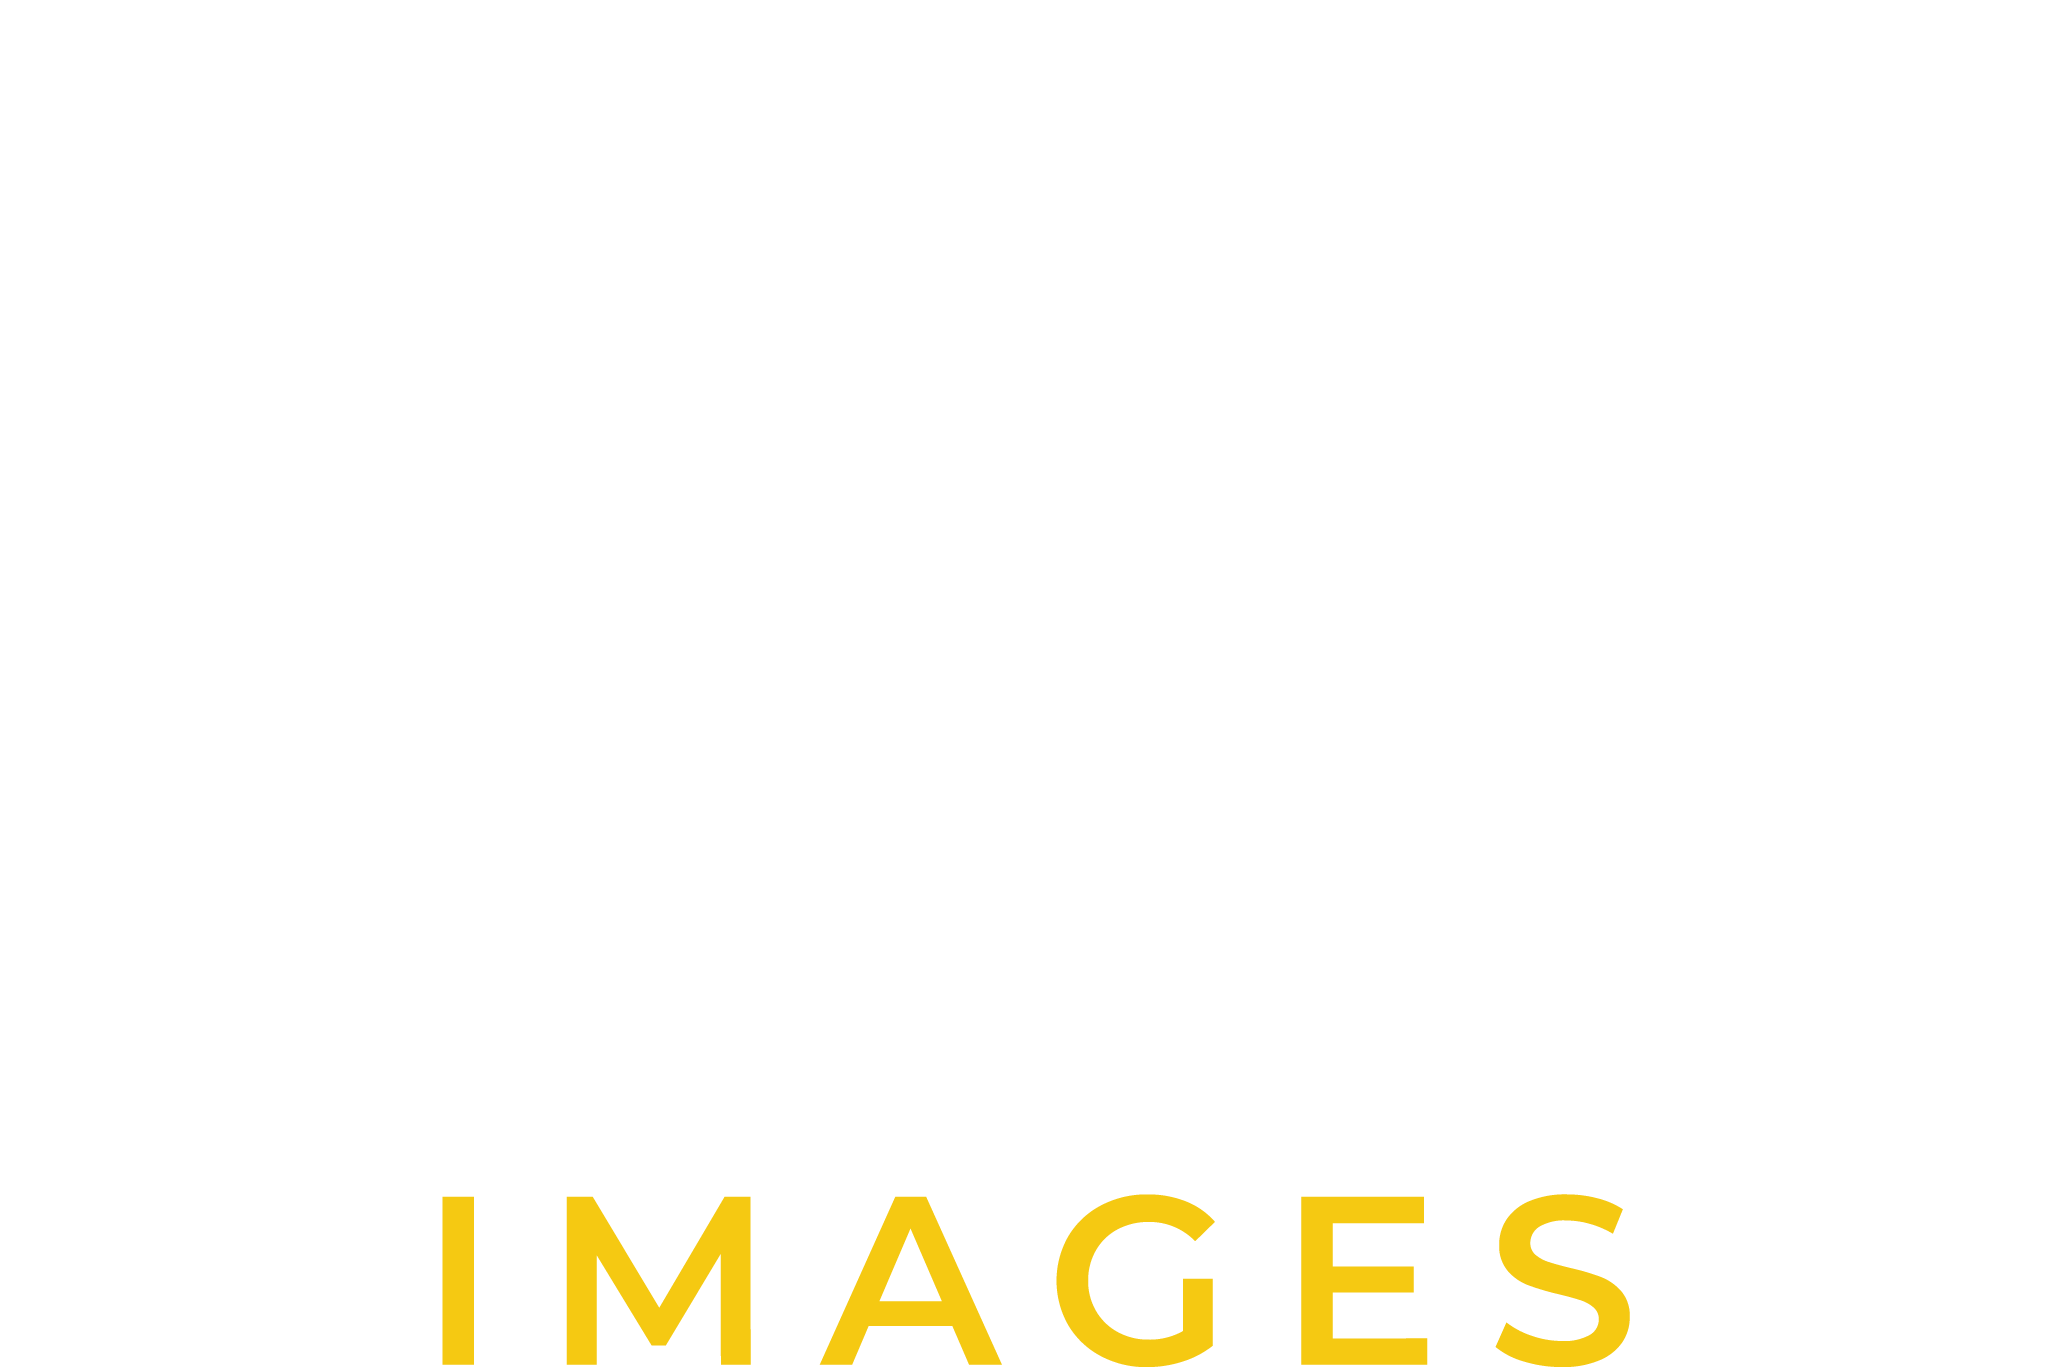 Tom Mackie Images Logo